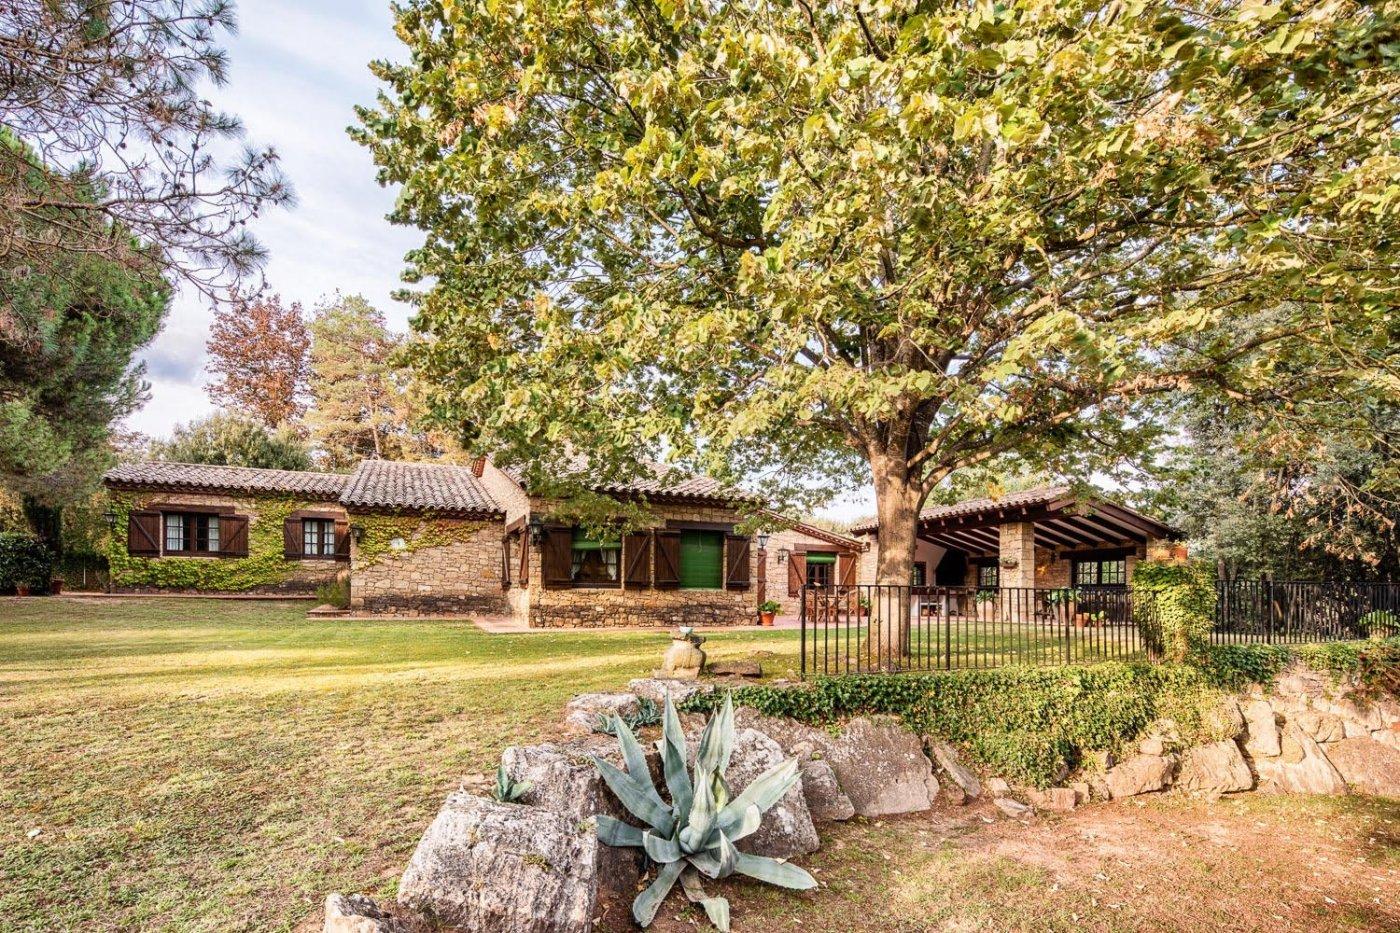 Casa  Sant quirze safaja ,sant quirze de safaja. Villa de 340 m2 con un fantástico jardín de 4.000 m2 de terreno